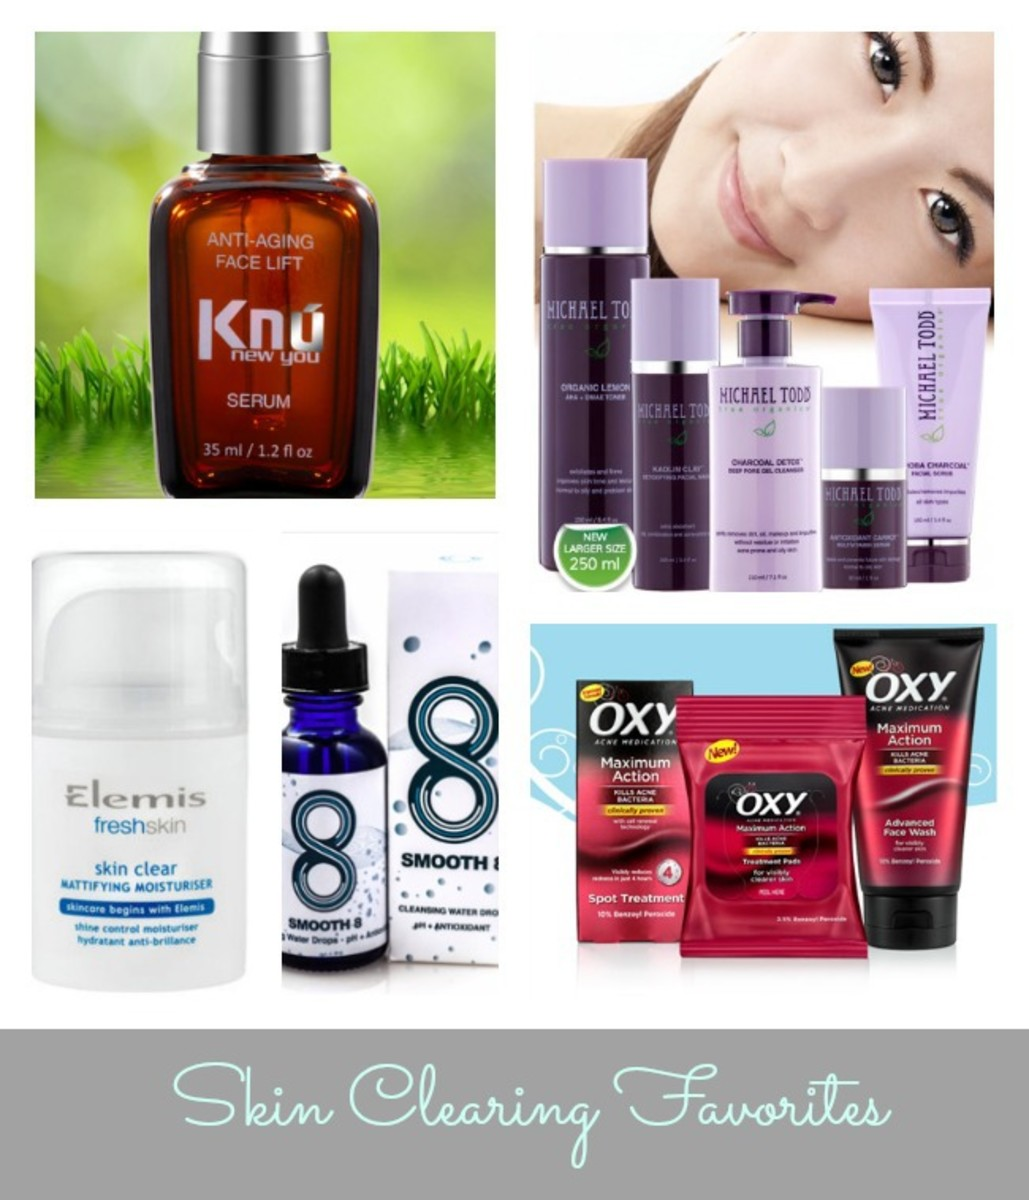 Skin Clearing, Skin Clearing tips, acne